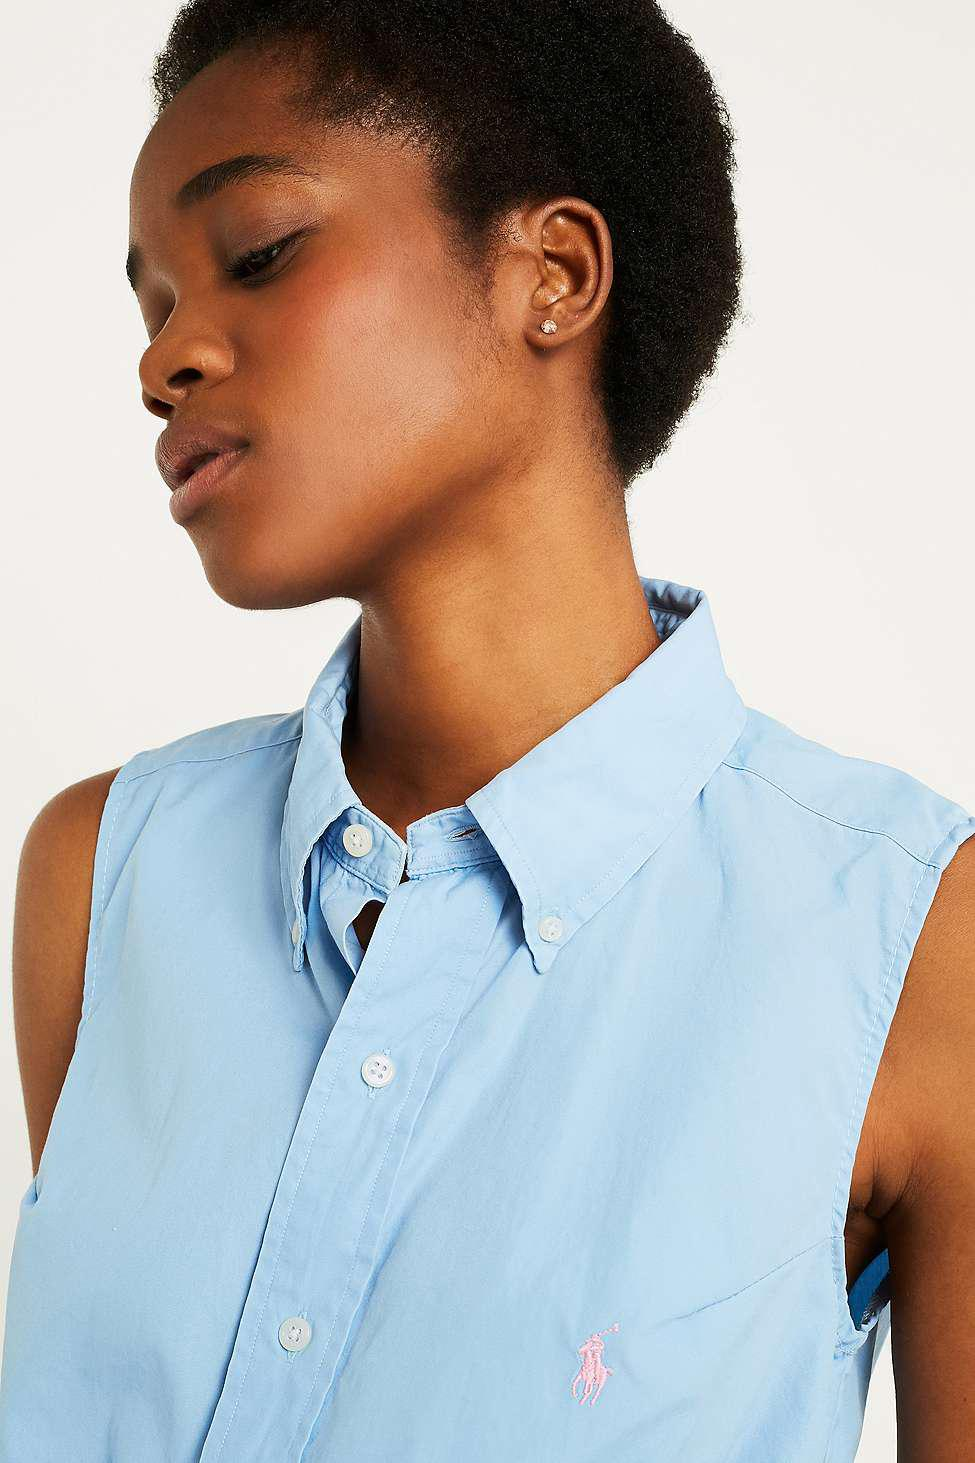 997e2b3fef21d Urban Renewal Vintage Customised Ralph Lauren Sleeveless Tie-front ...